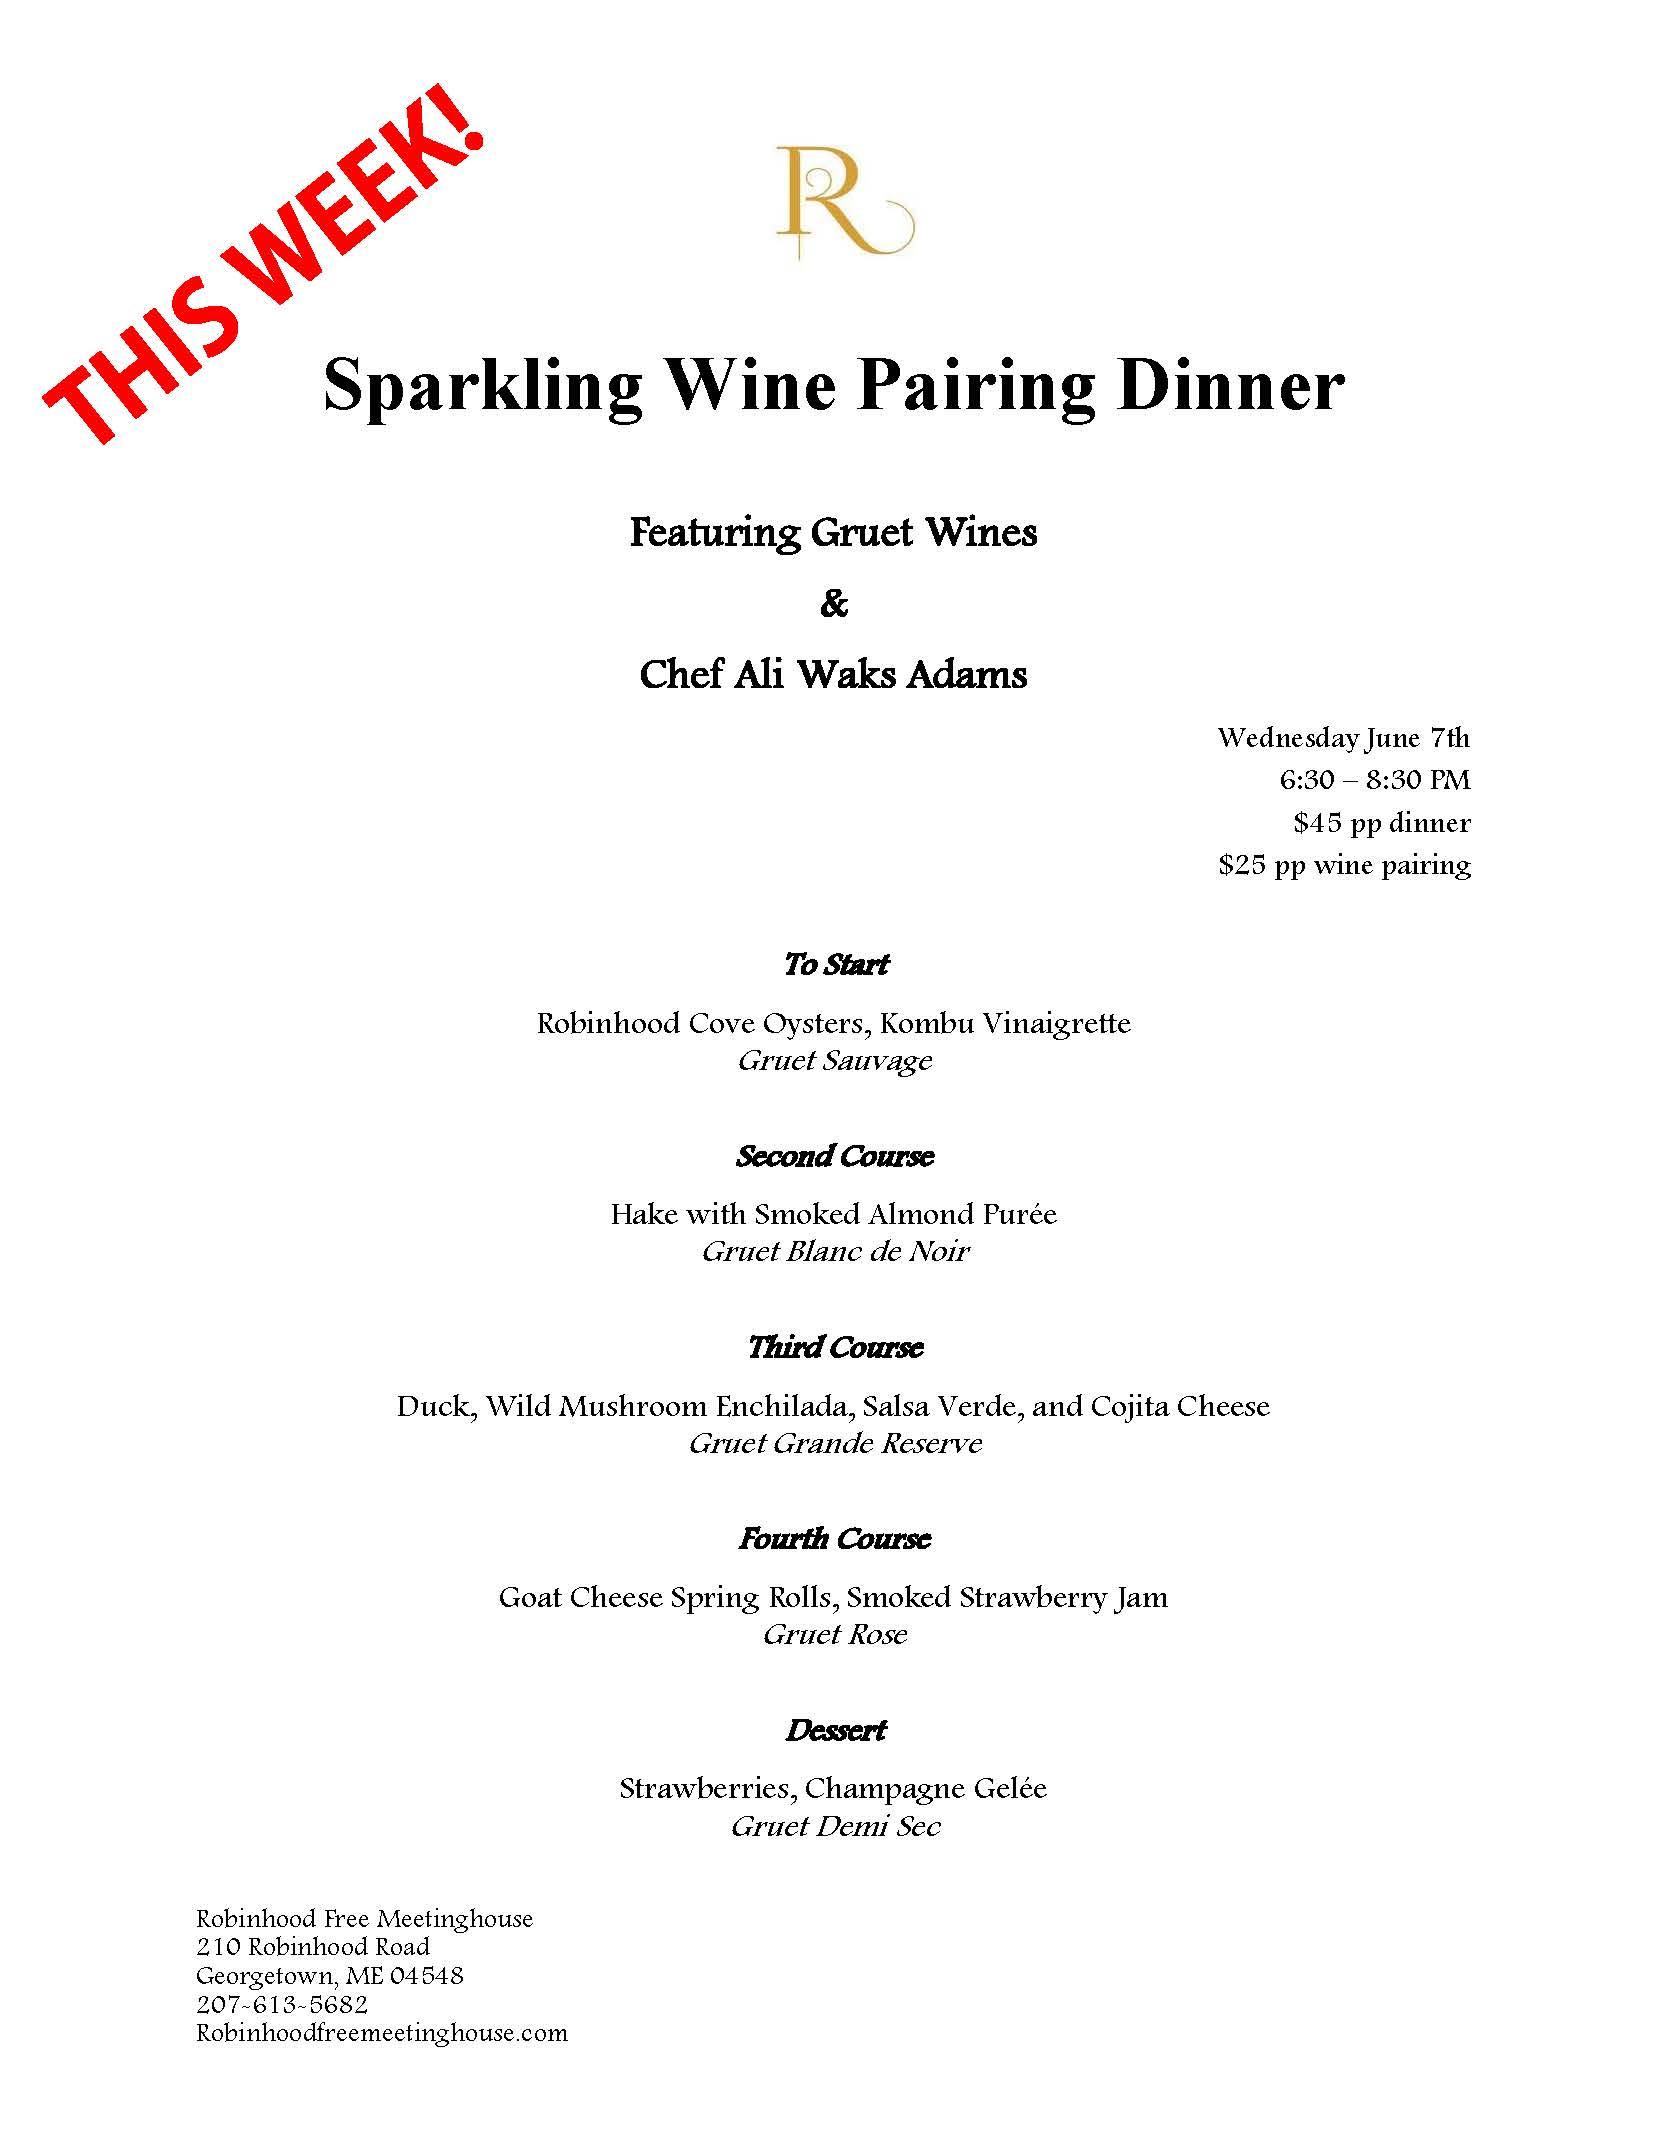 Sparkling Wine Pairing Dinner featuring Gruet - Robinhood Free Meetinghouse